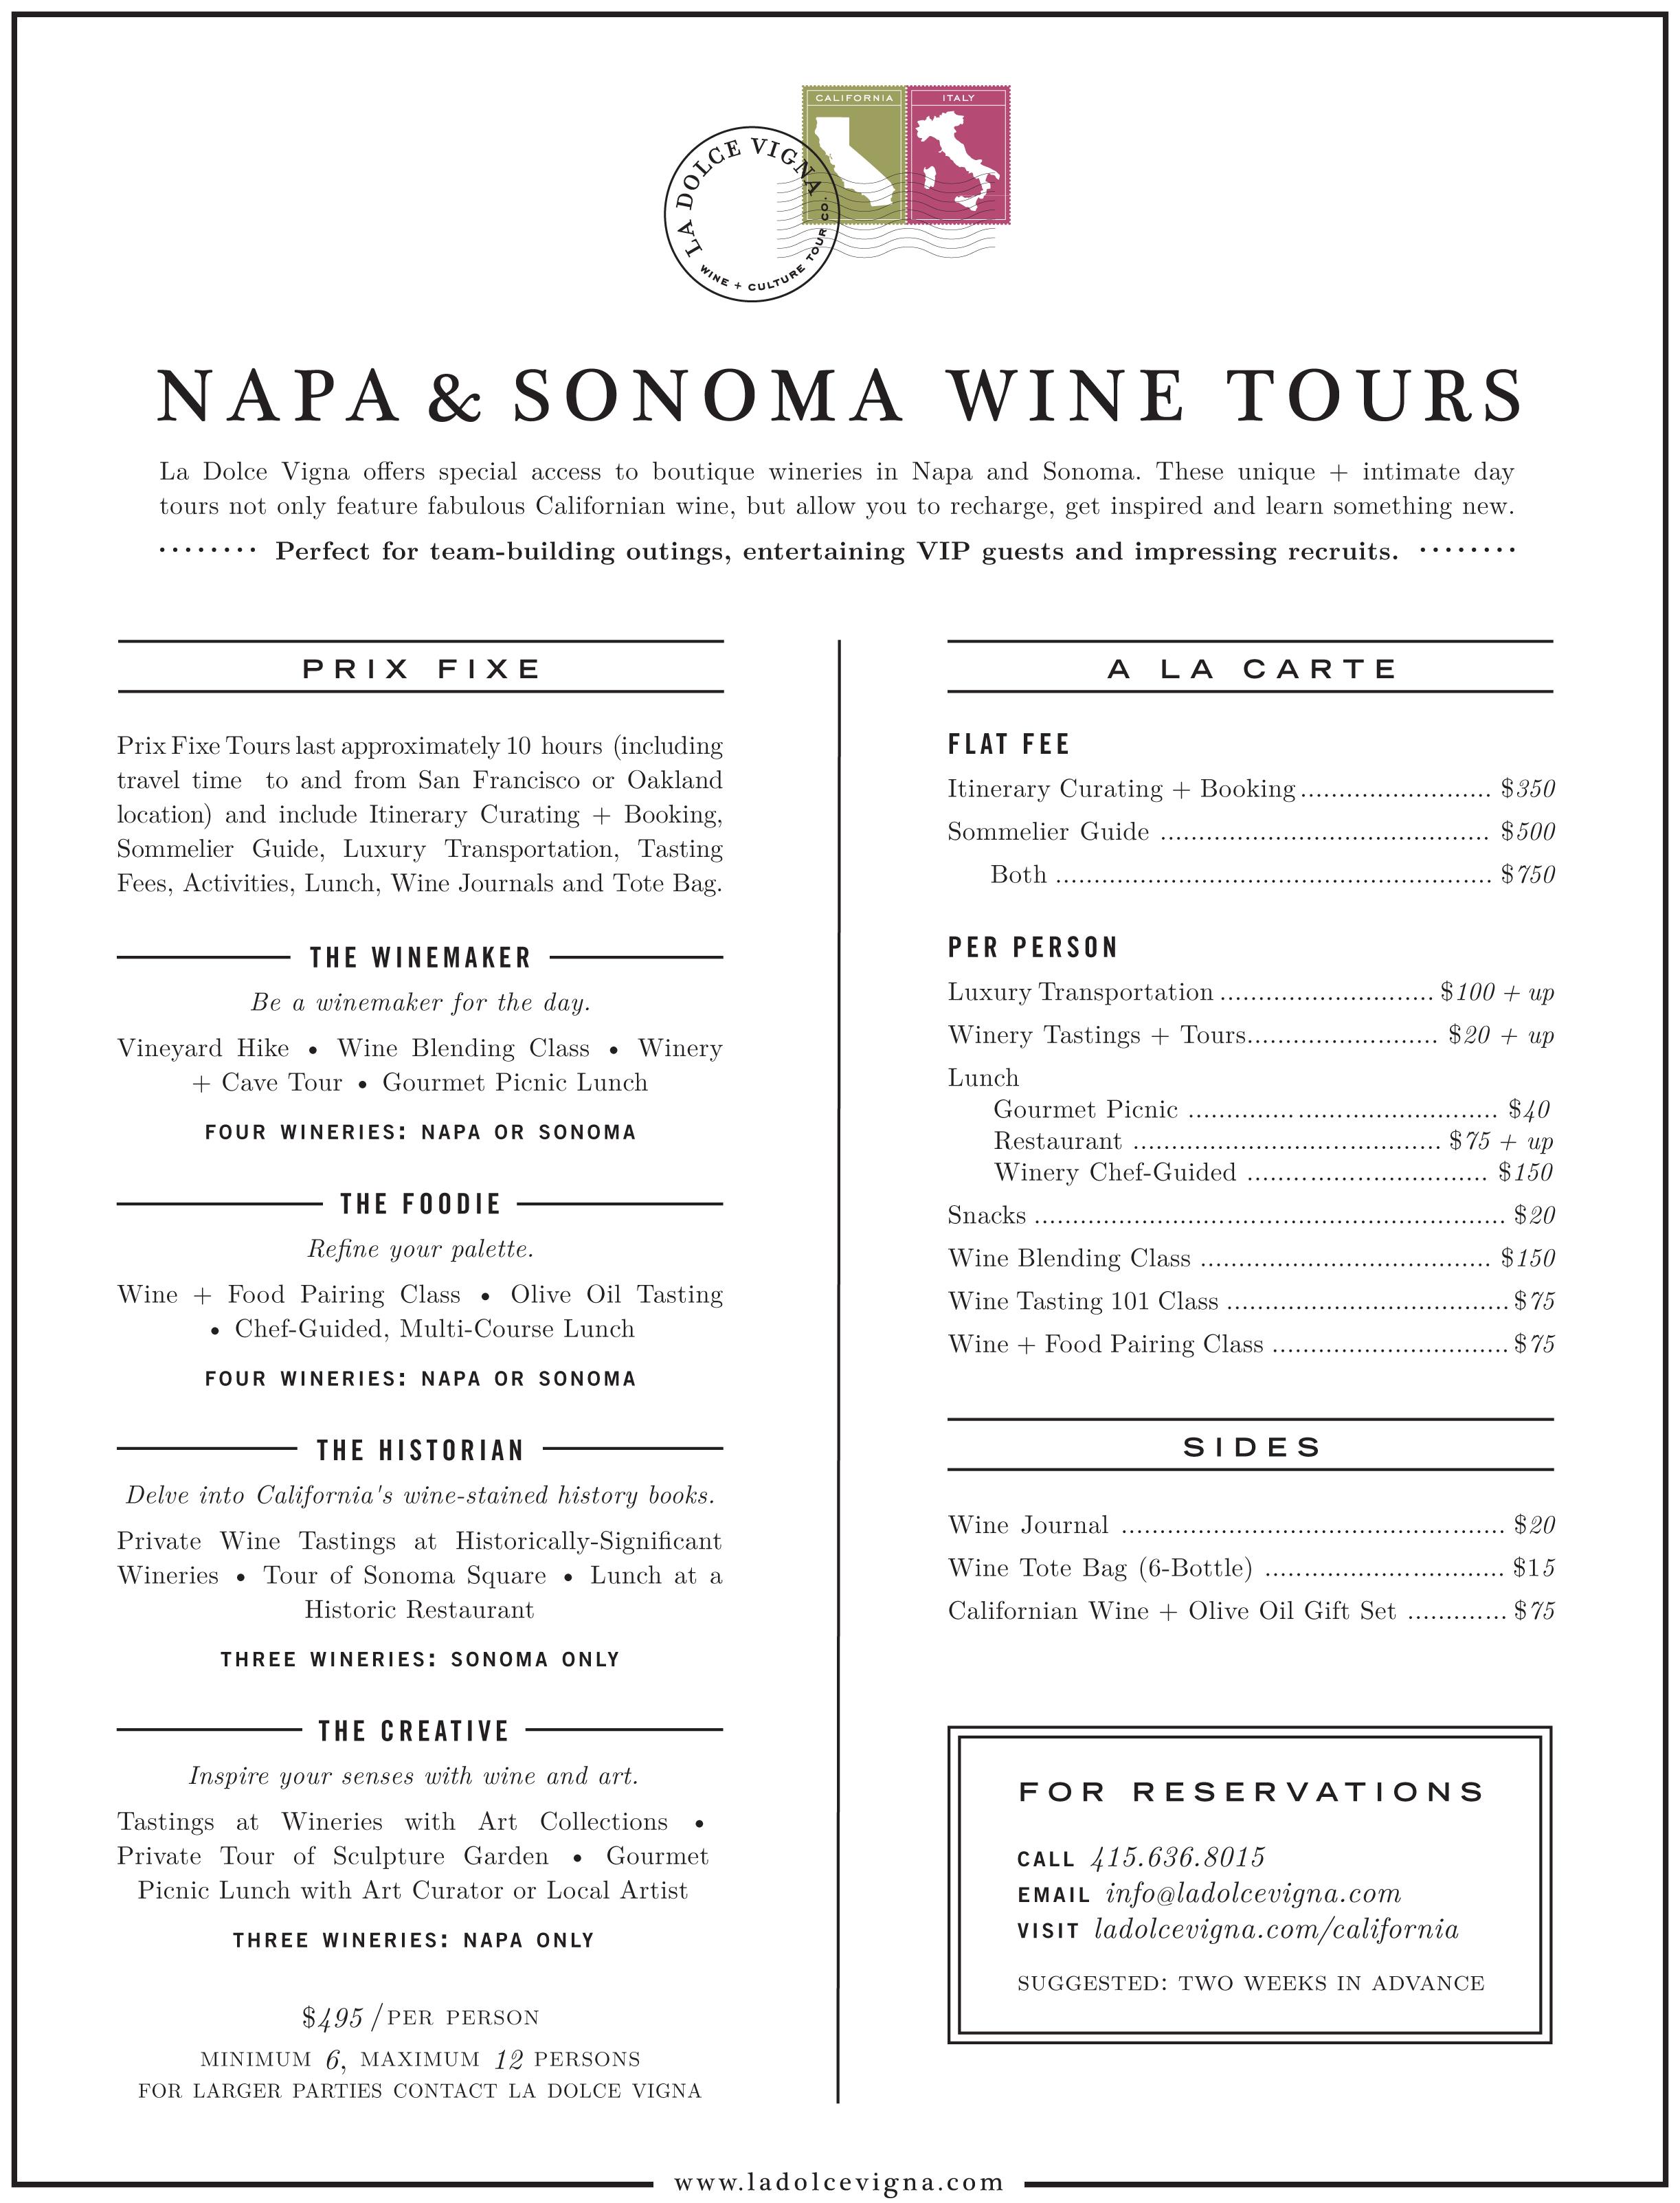 La Dolce Vigna_Napa-Sonoma-Wine-Tours.jpg